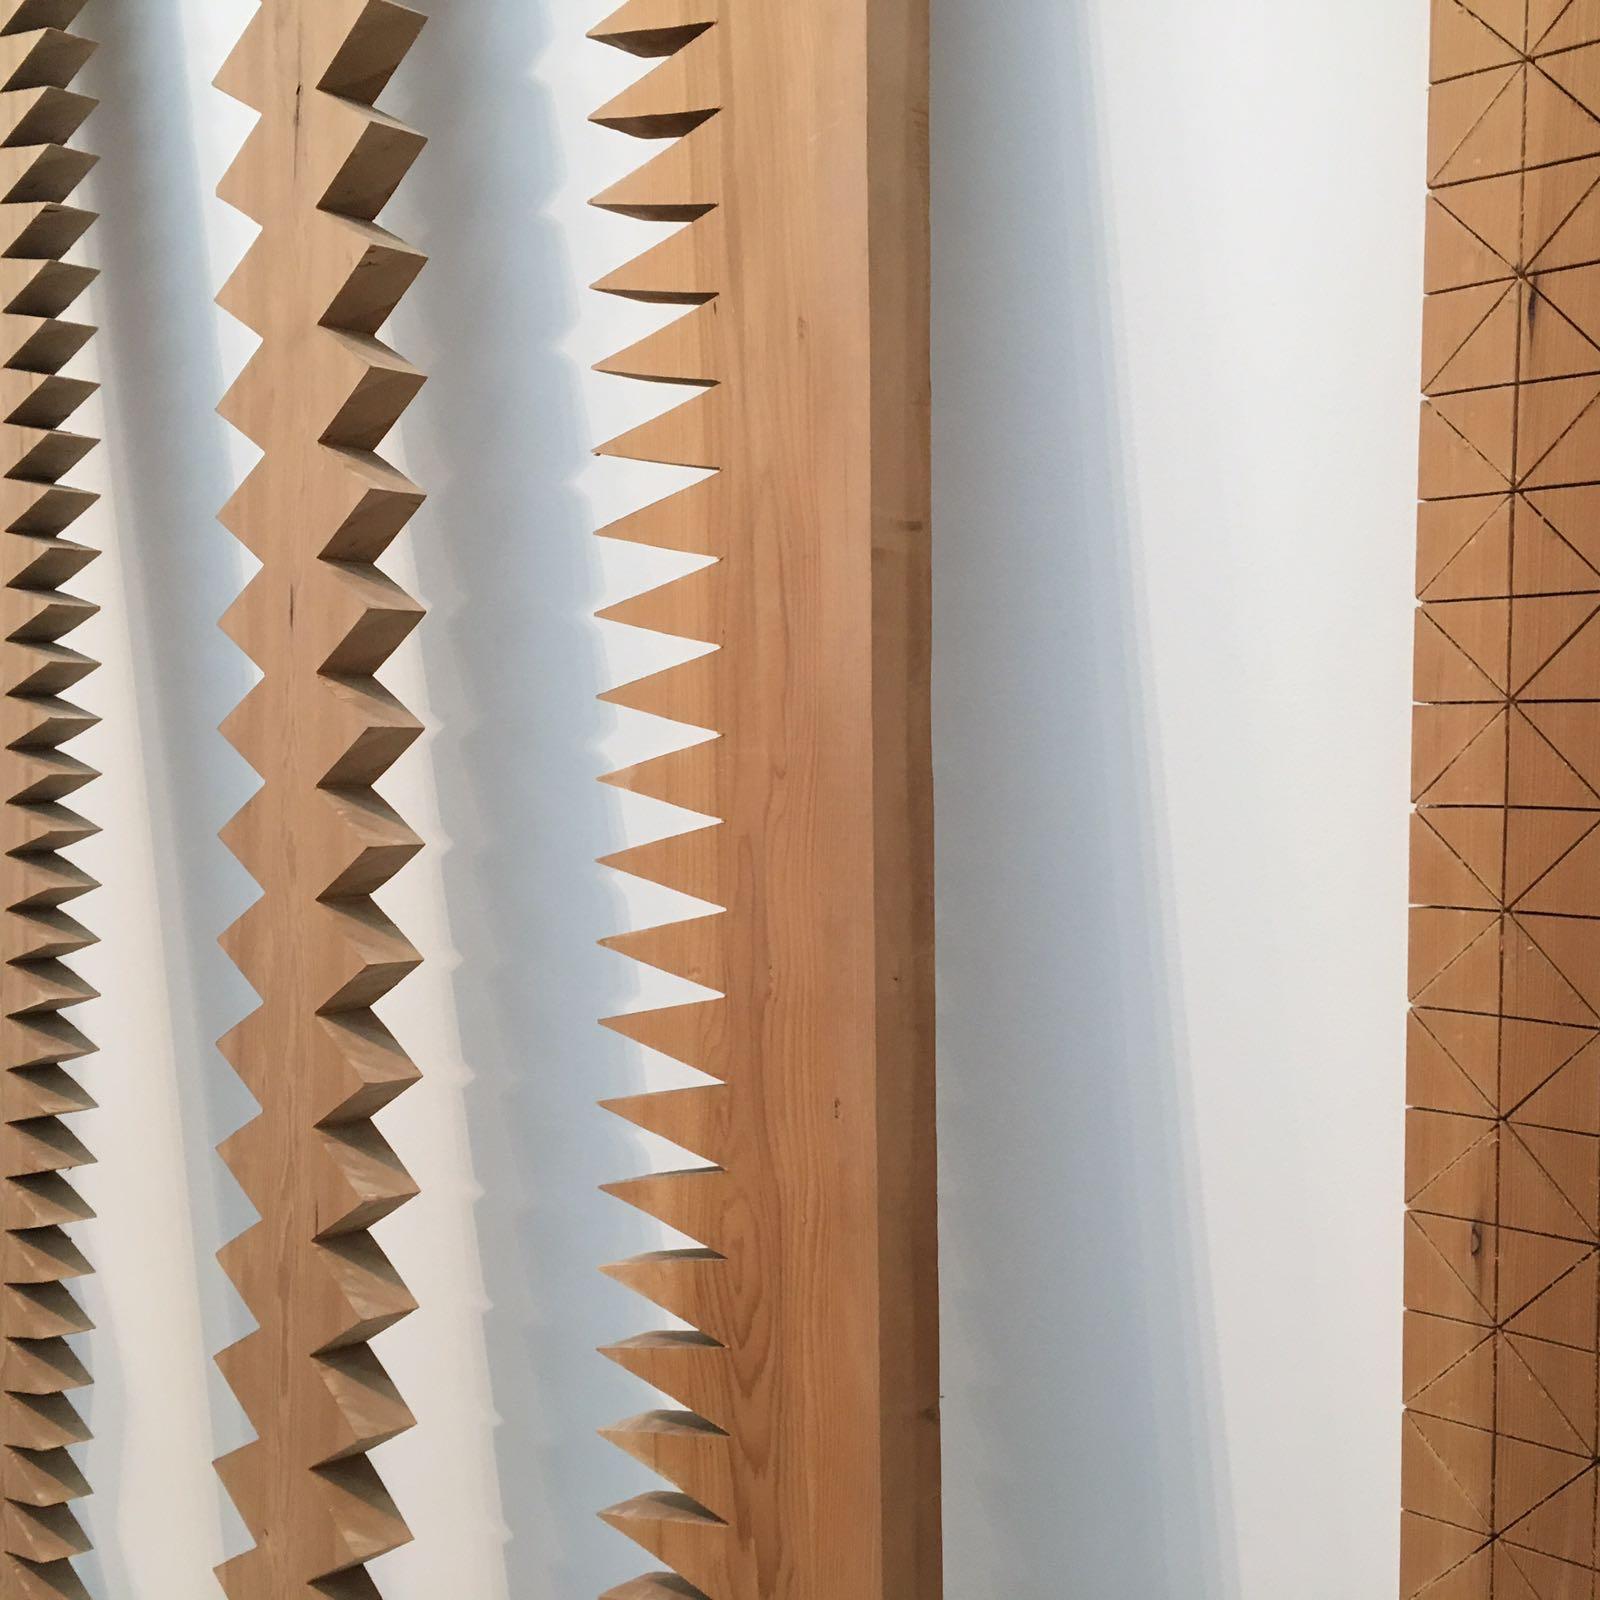 'From surface to surface' by Susuma Koshimizu   Tate Modern, London   UK